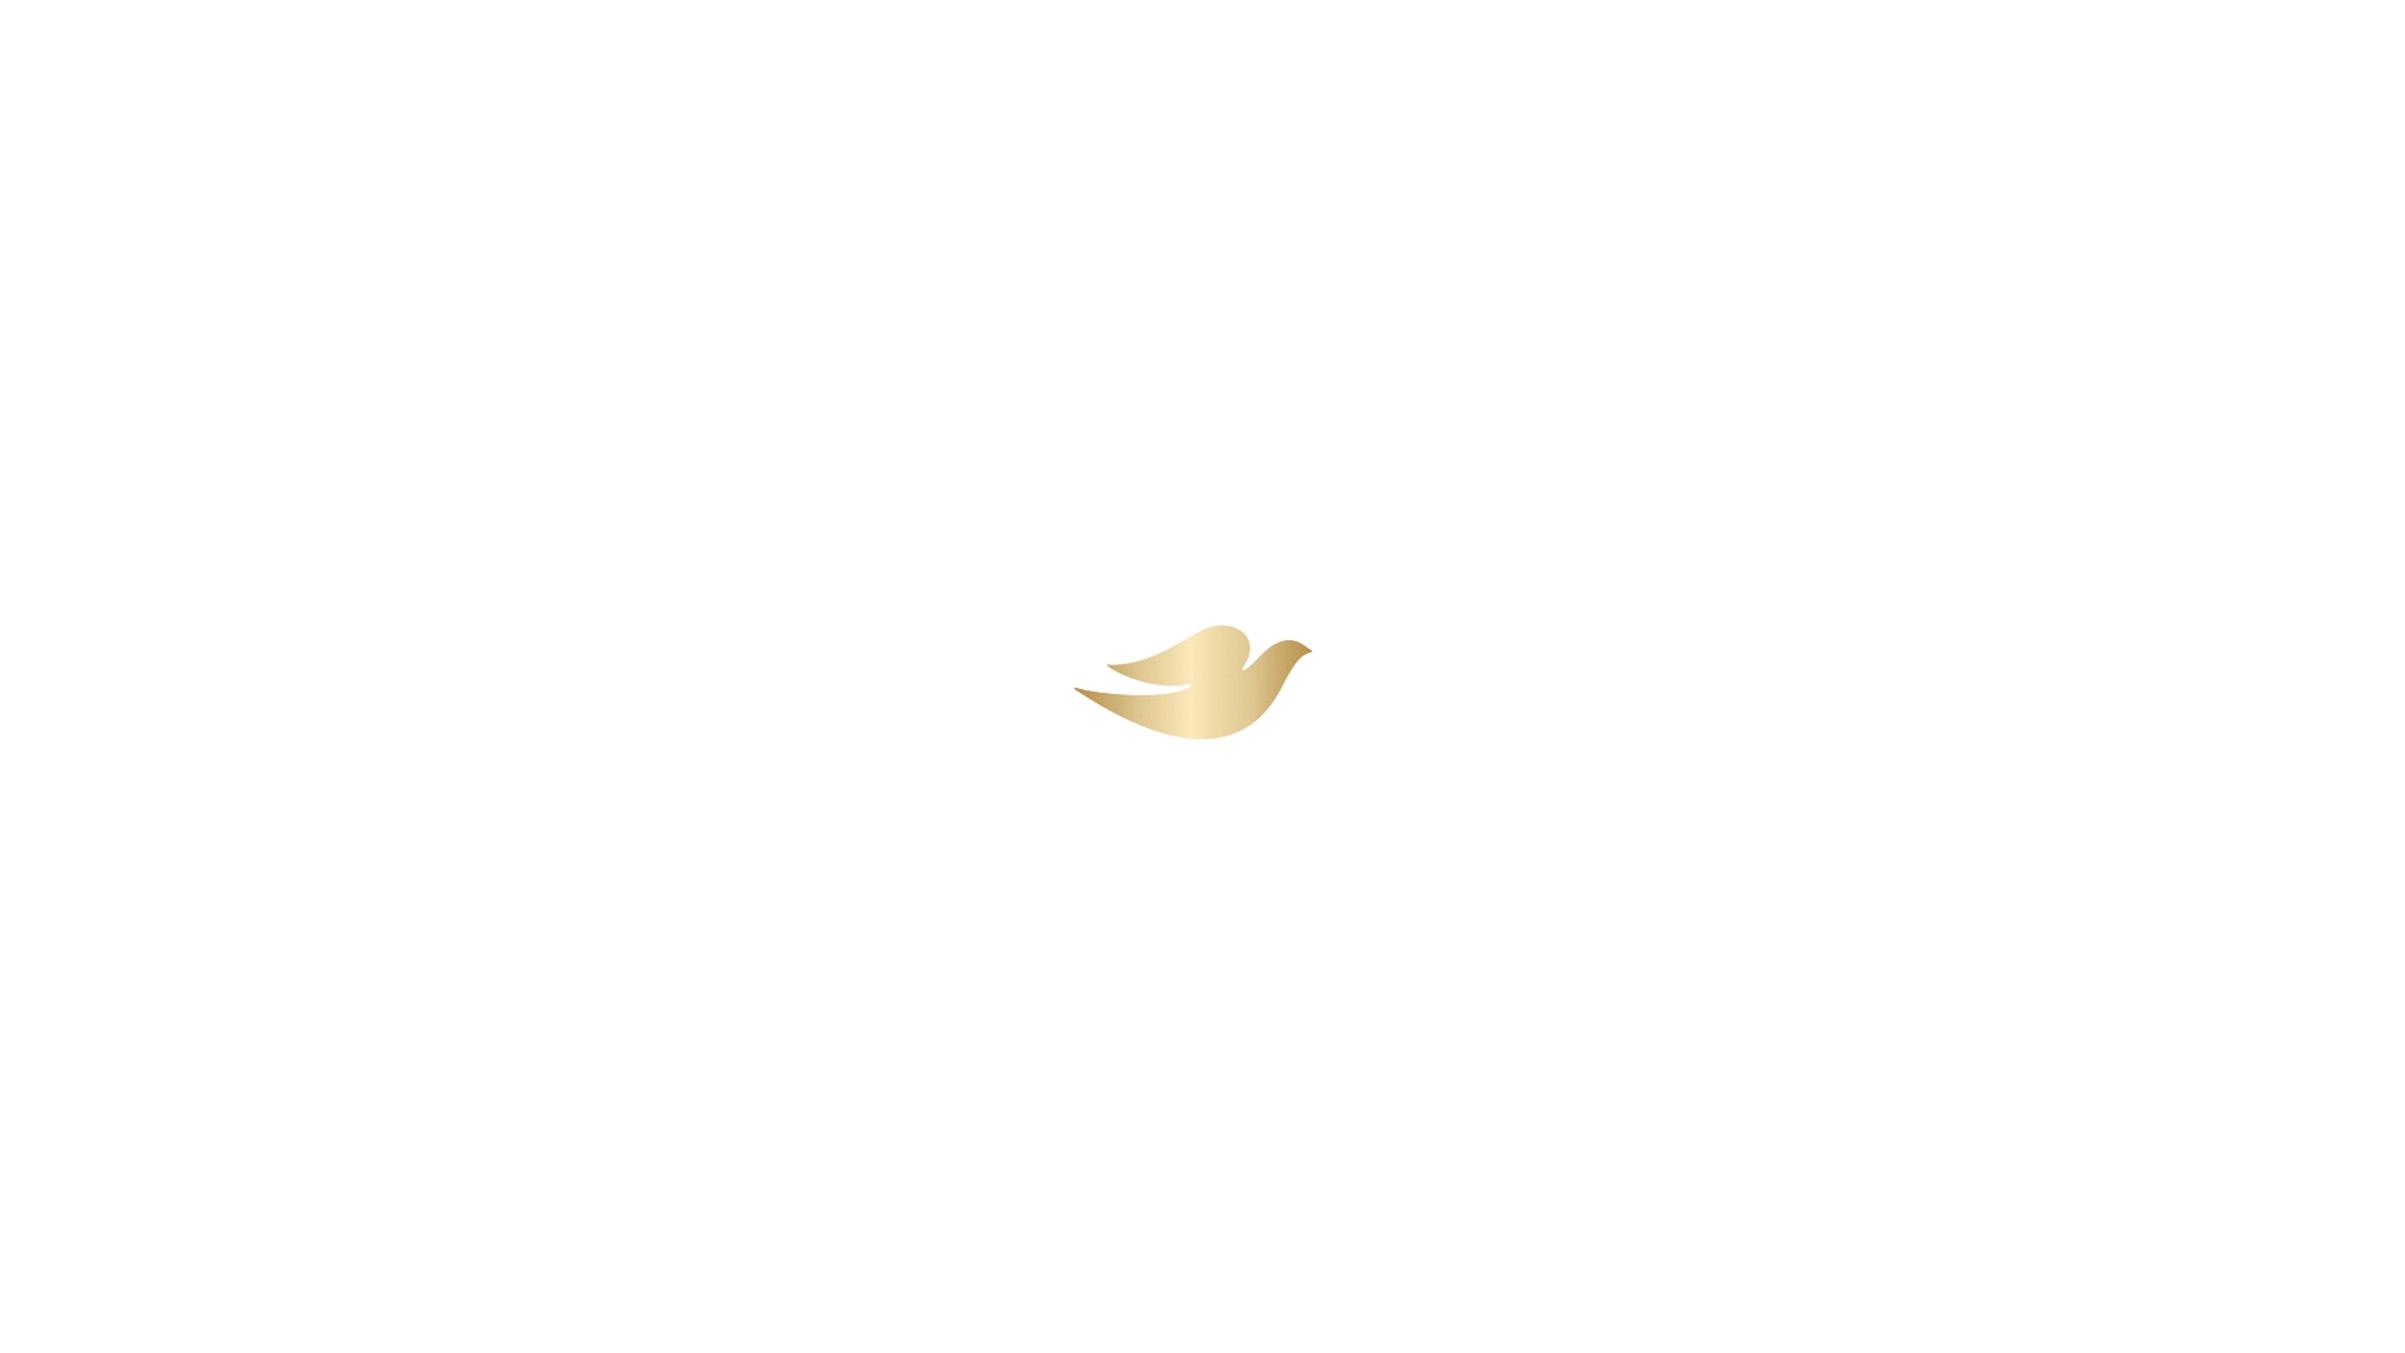 Dove_Image_08_01.jpg